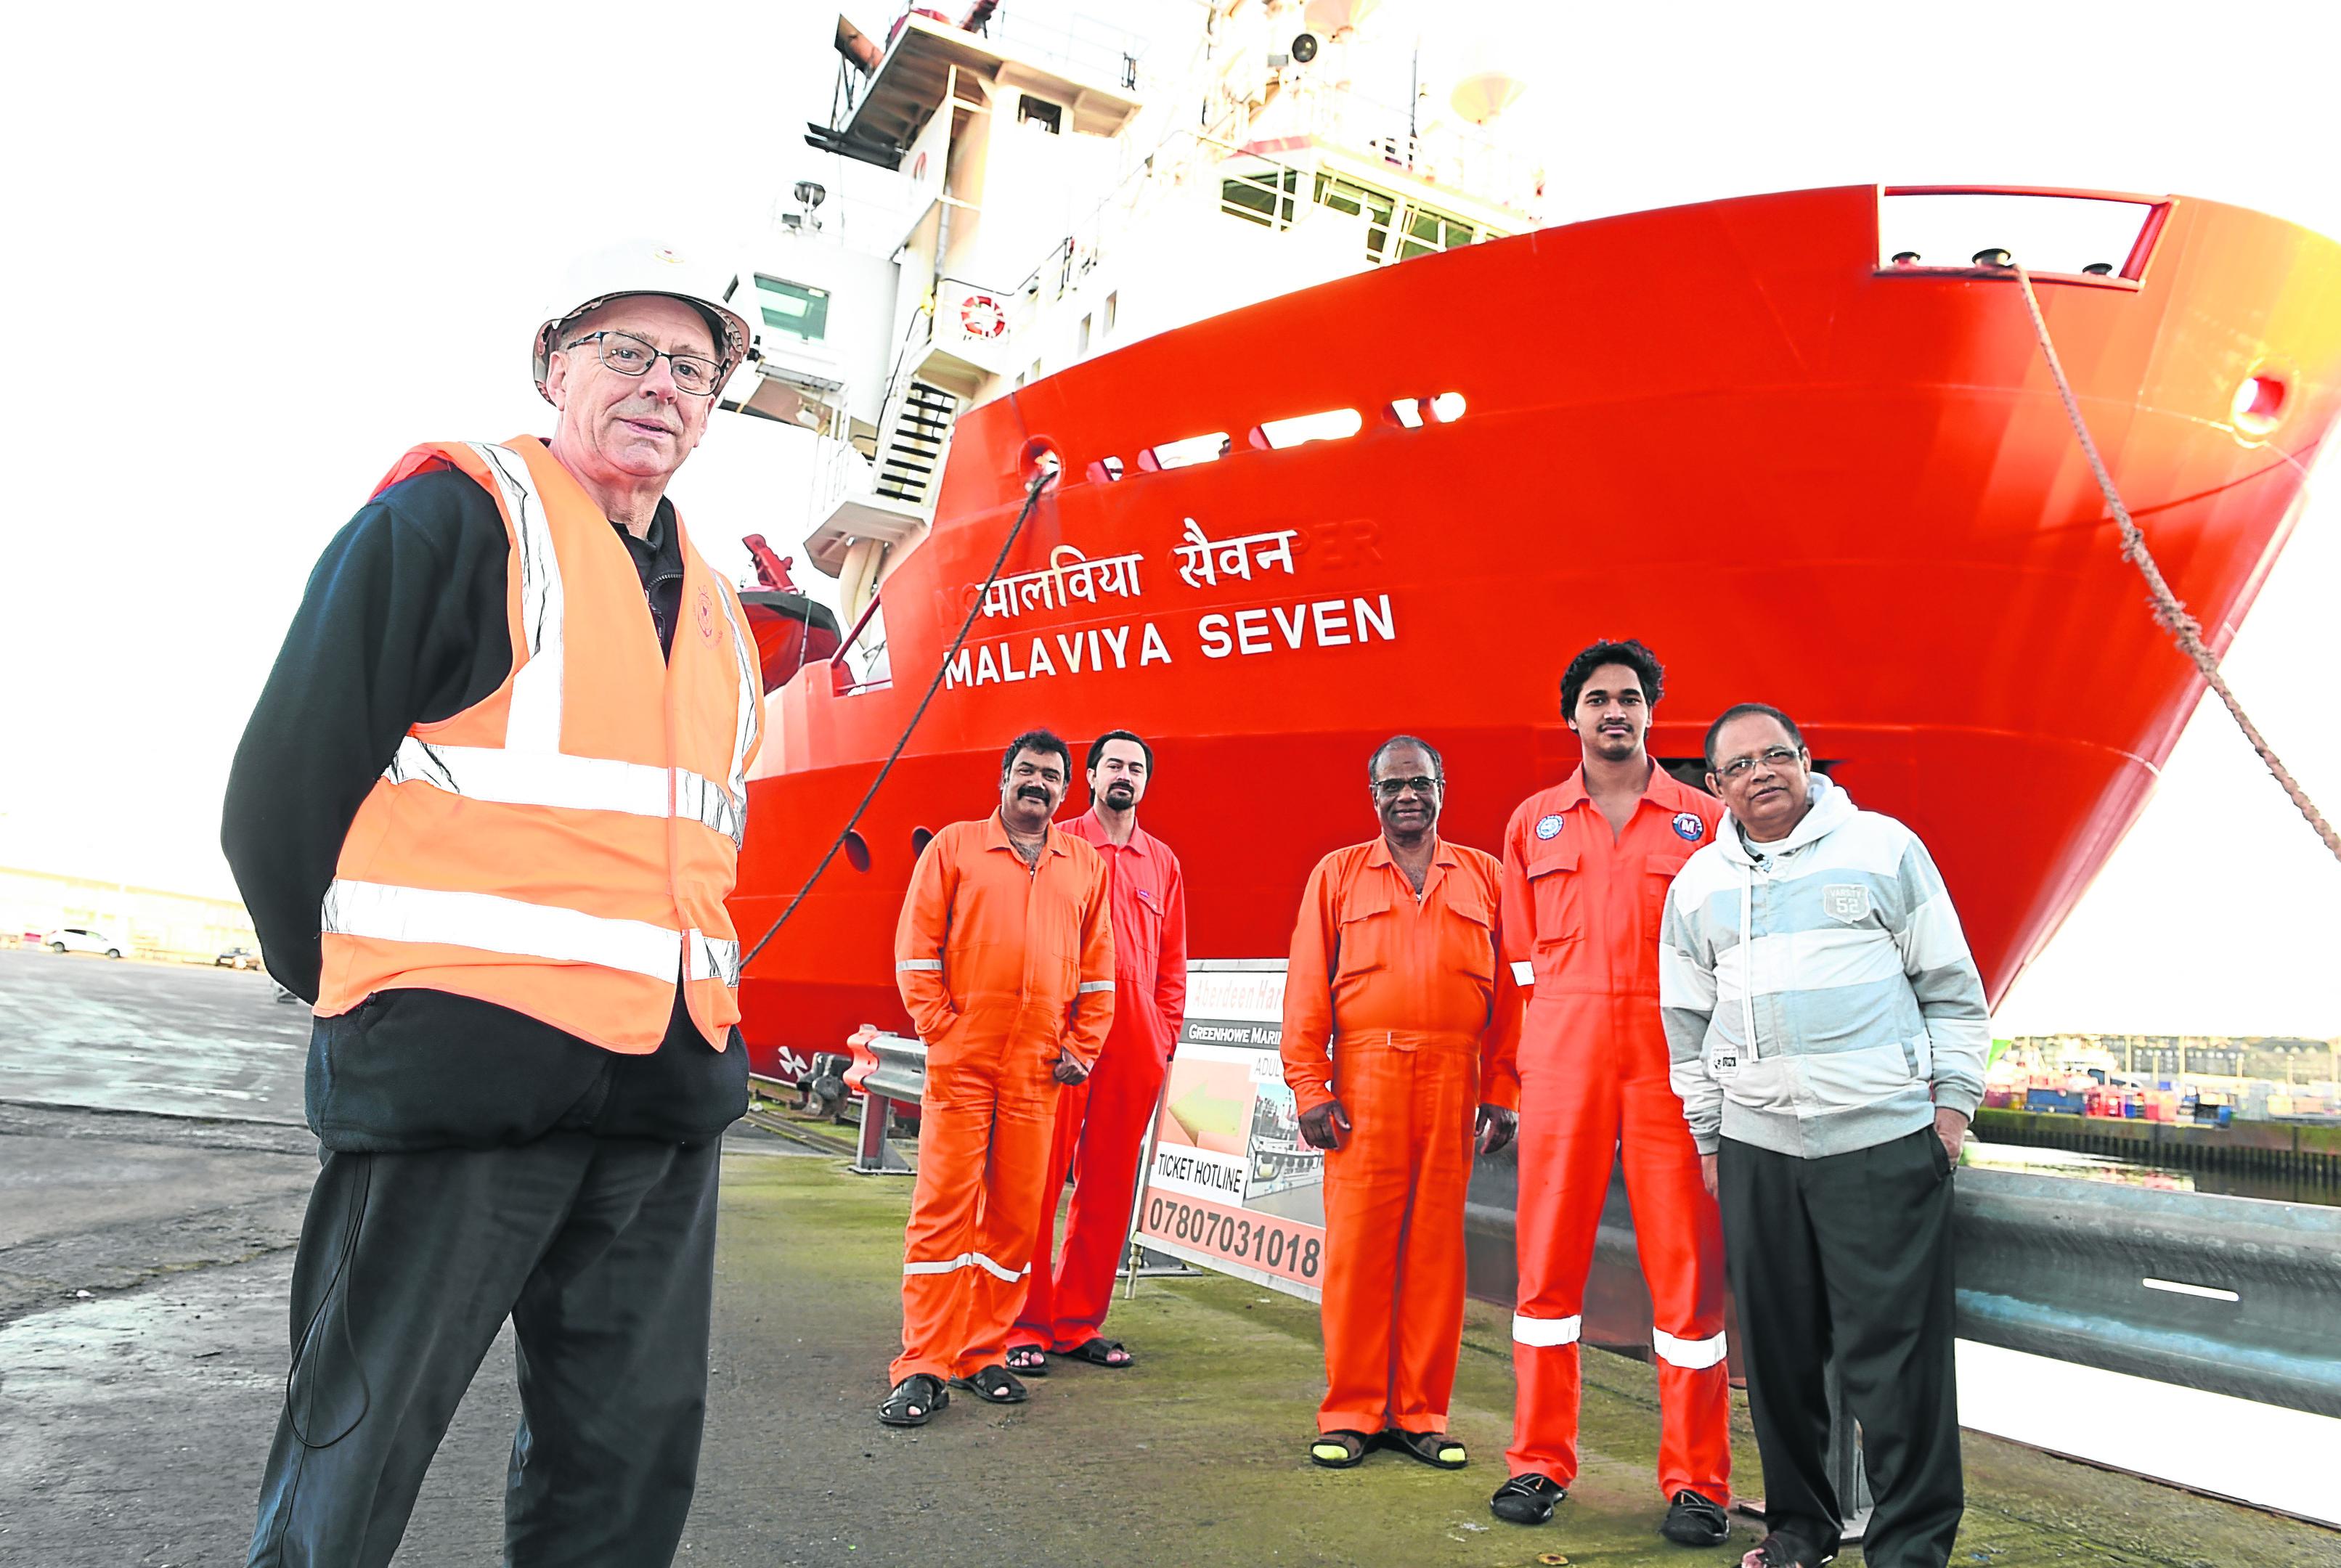 (from left) Doug Duncan, the Aberdeen port chaplain for Catholic charity Apostleship of the Sea, with Malaviya Seven crew members Clay Vaz, Ashish Prabhakar, Bamadev Swain, Rahul Sharma and captain L.B. Singh.